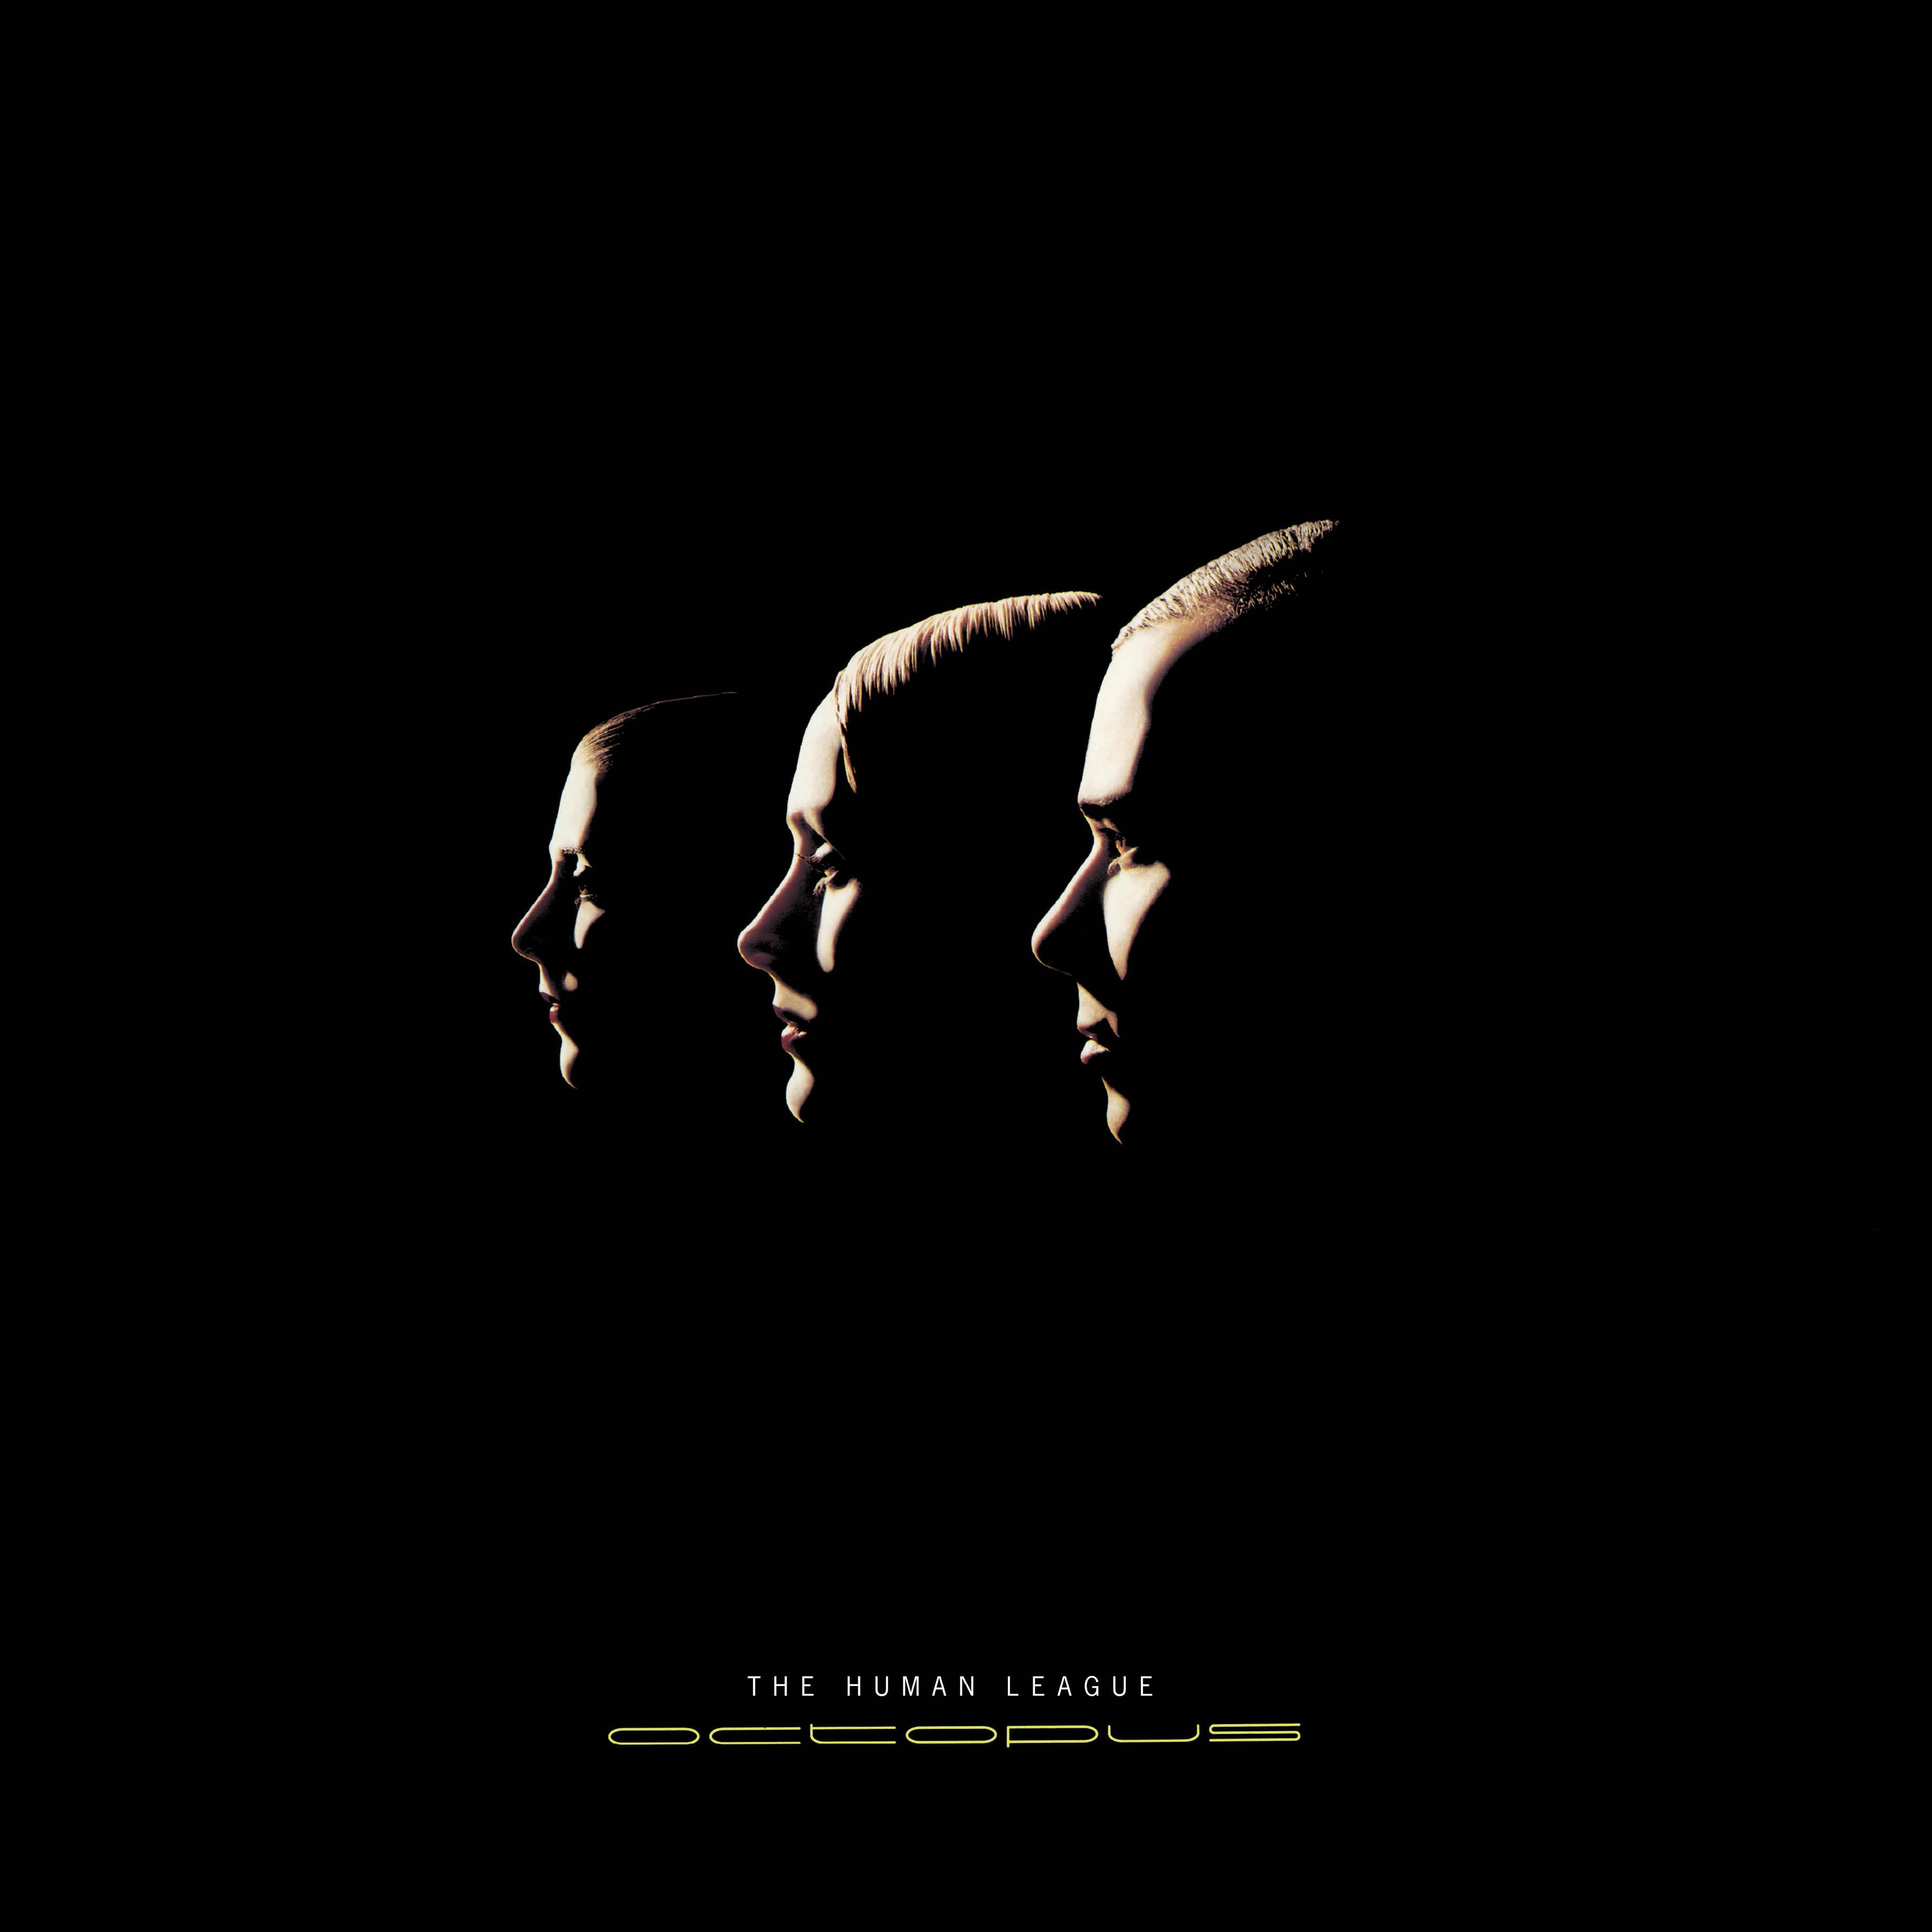 Octopus - The Human League - Musik - Warner Music UK - 0190295402334 - March 6, 2020